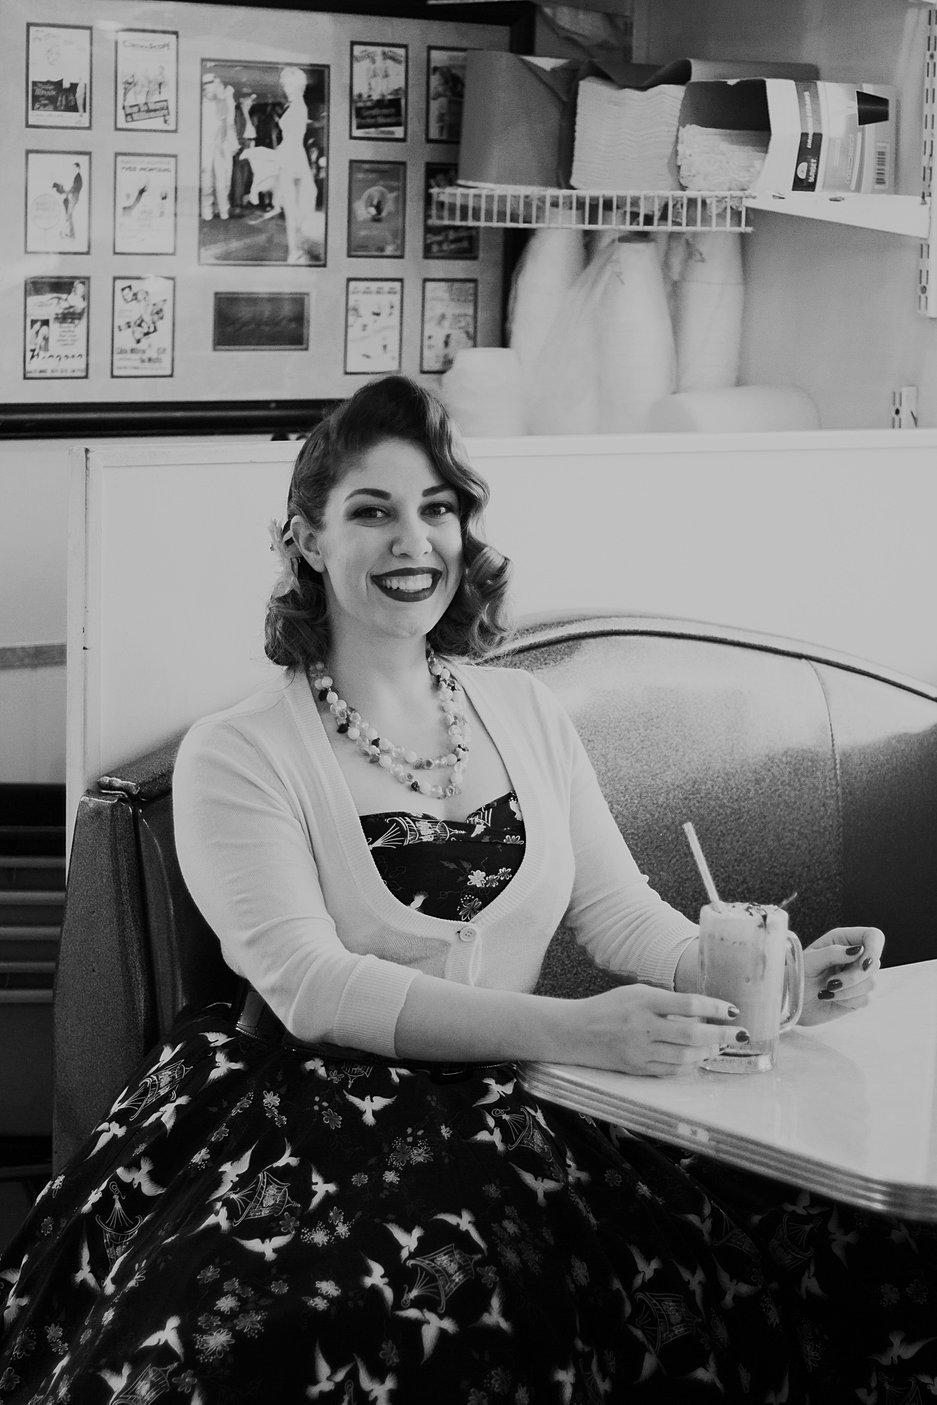 Vintage 50s Diner NC 12 Of 29